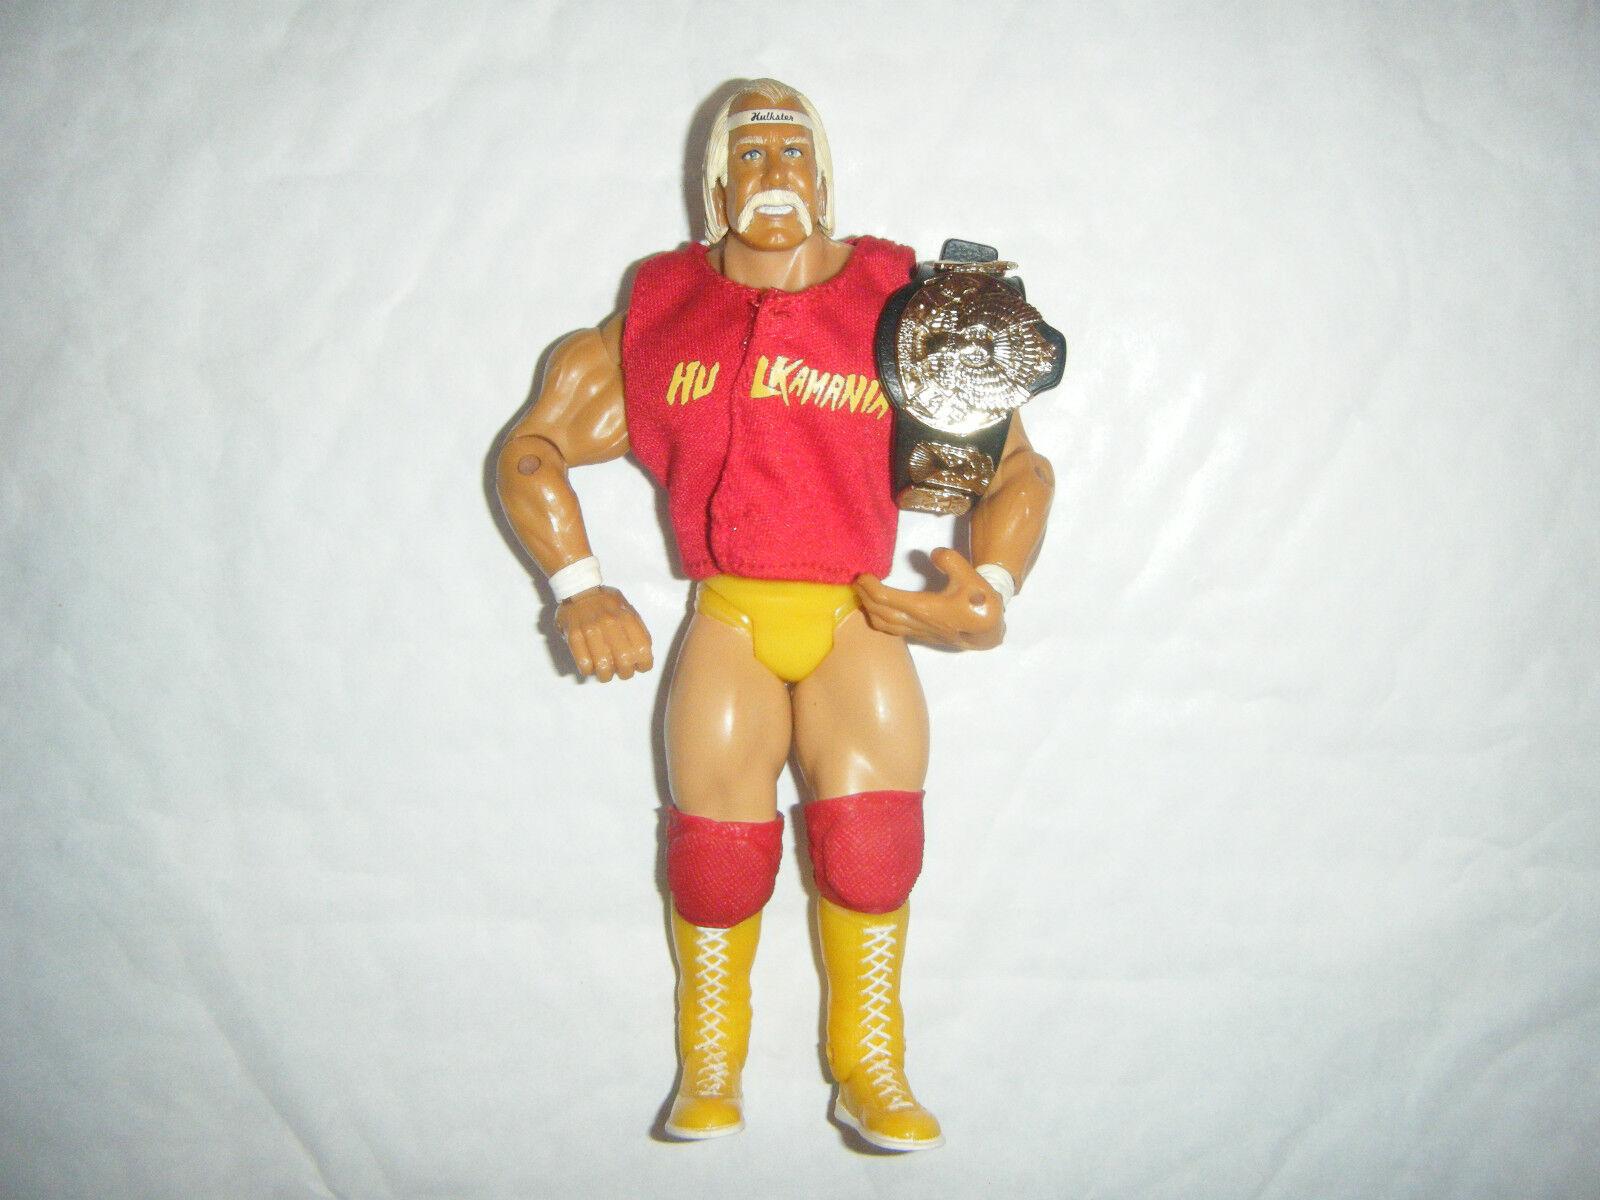 Hulk Hogan & Zubehör Shirt Klassisch Serie 8 Gürtel Aktion Wrestling-Figur Wwe